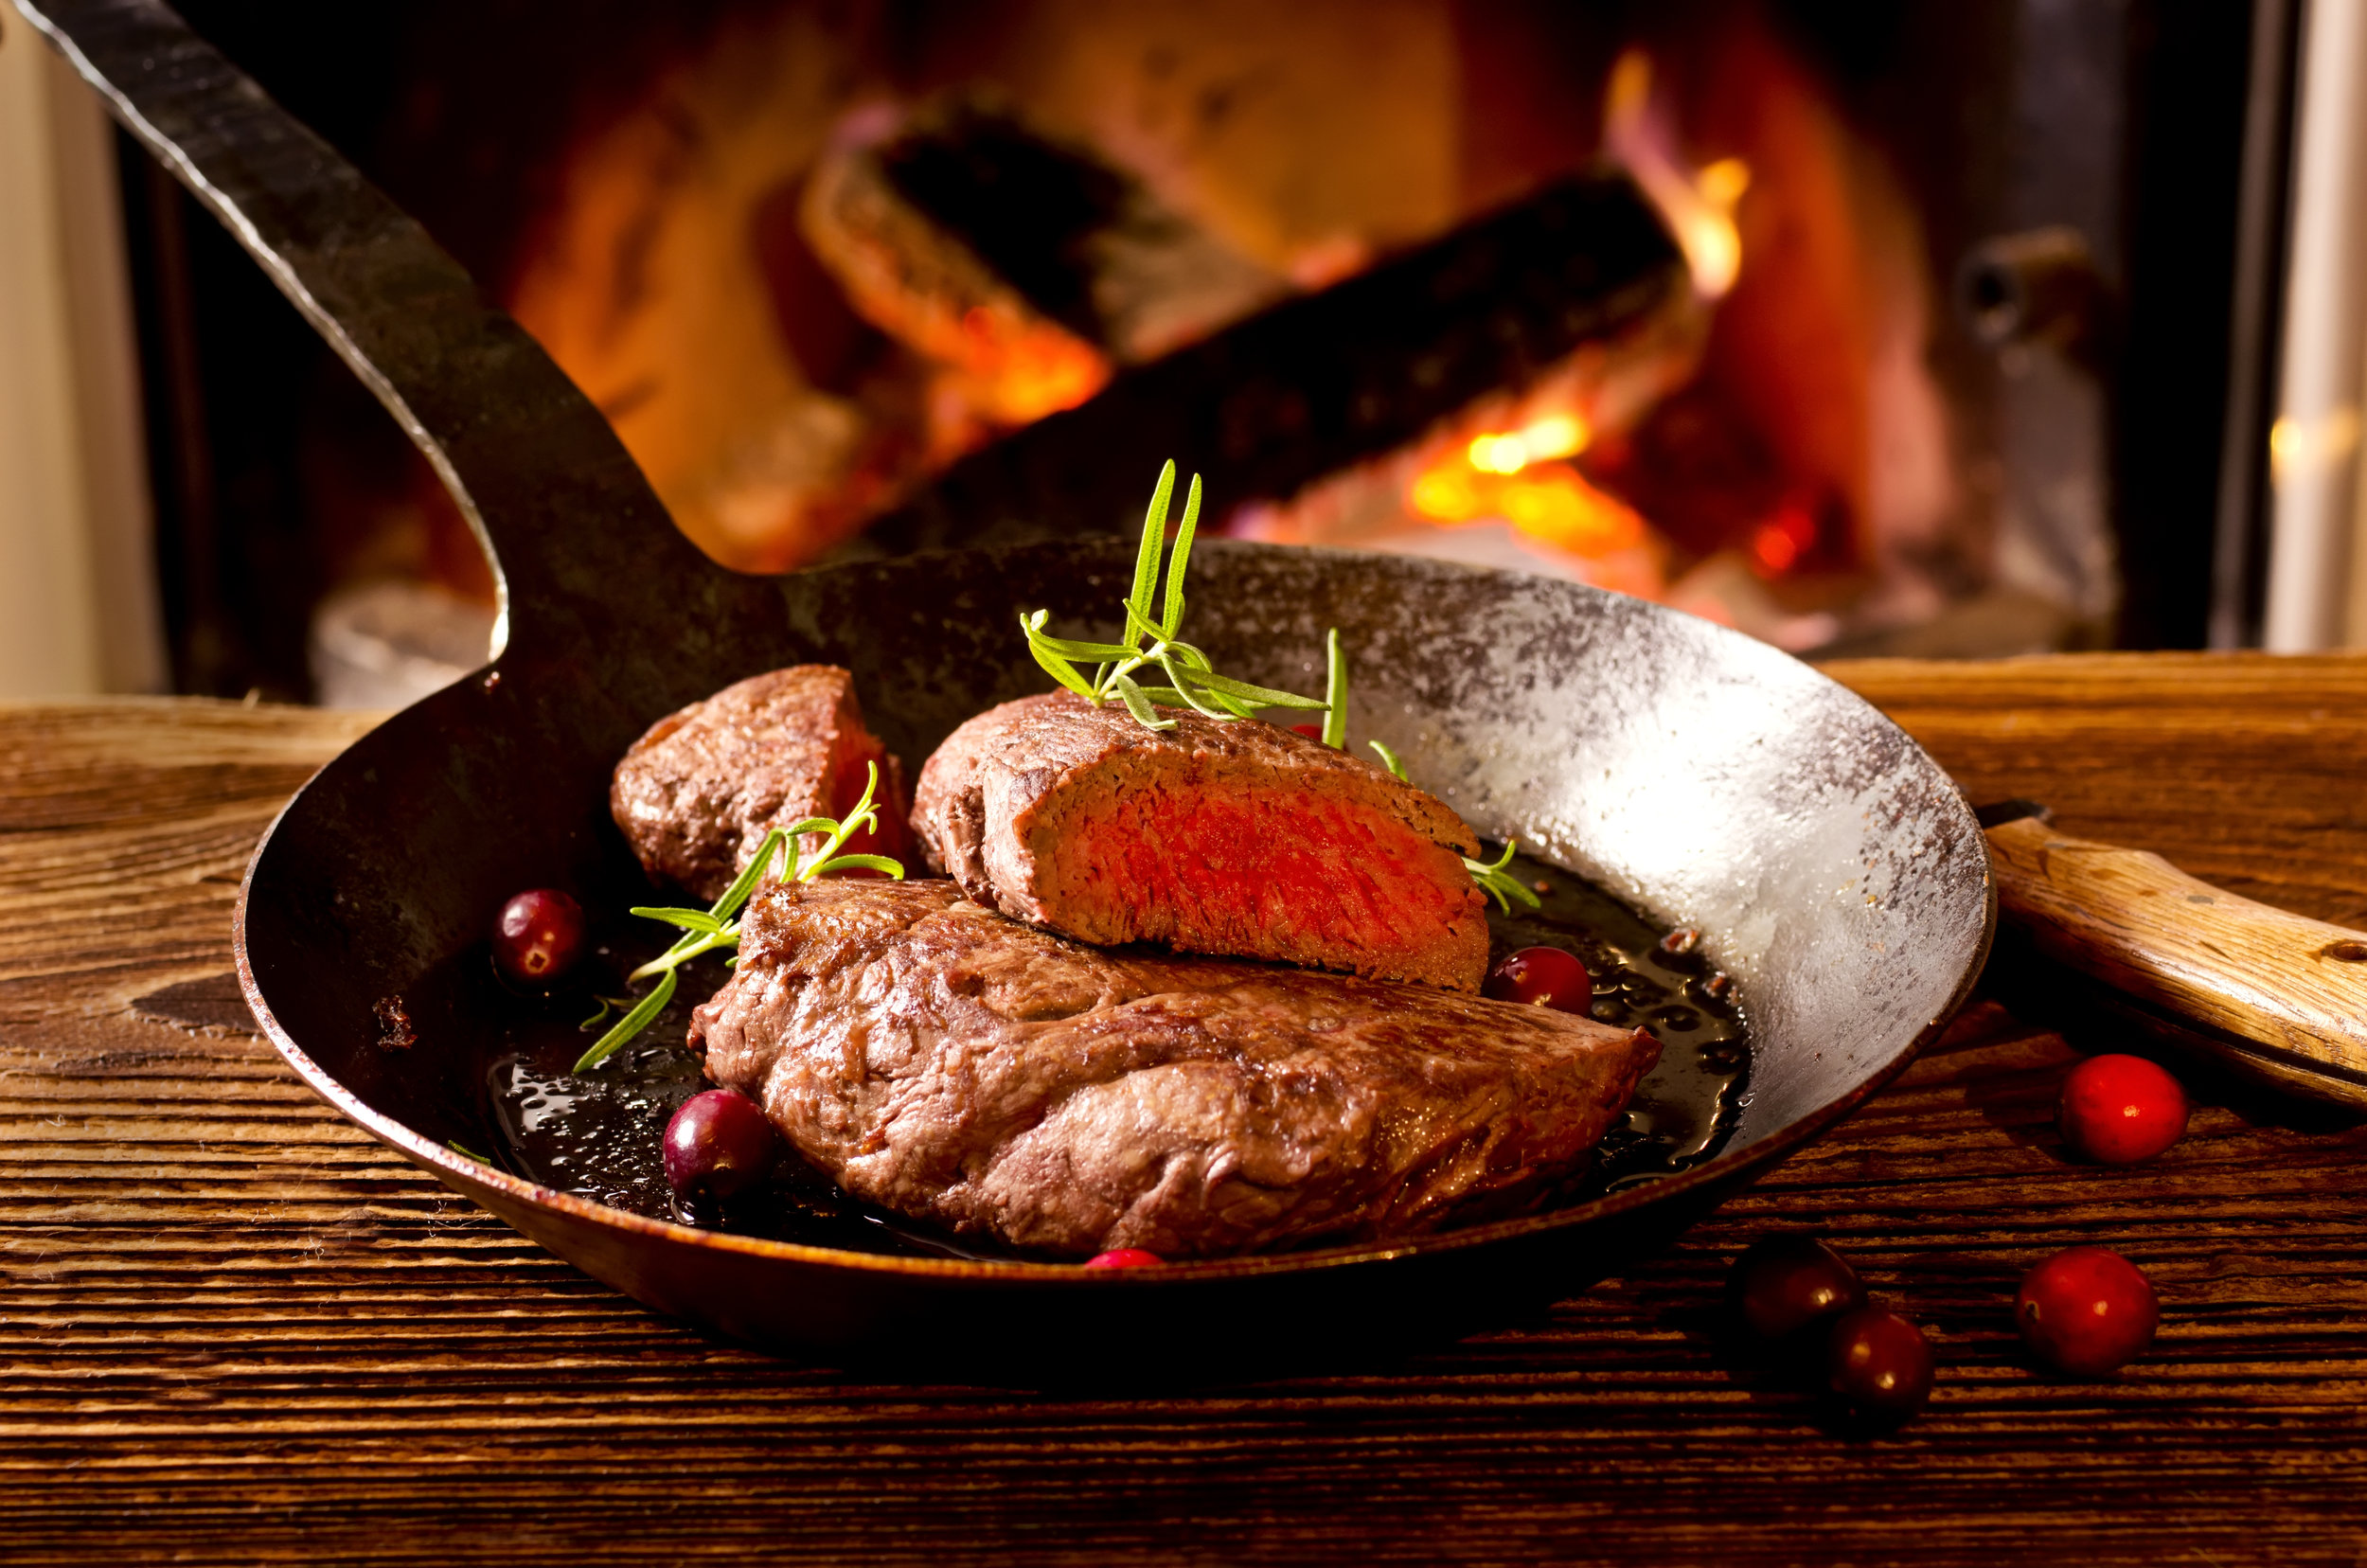 argentina_bigstock-beef-steaks-41872789.jpg